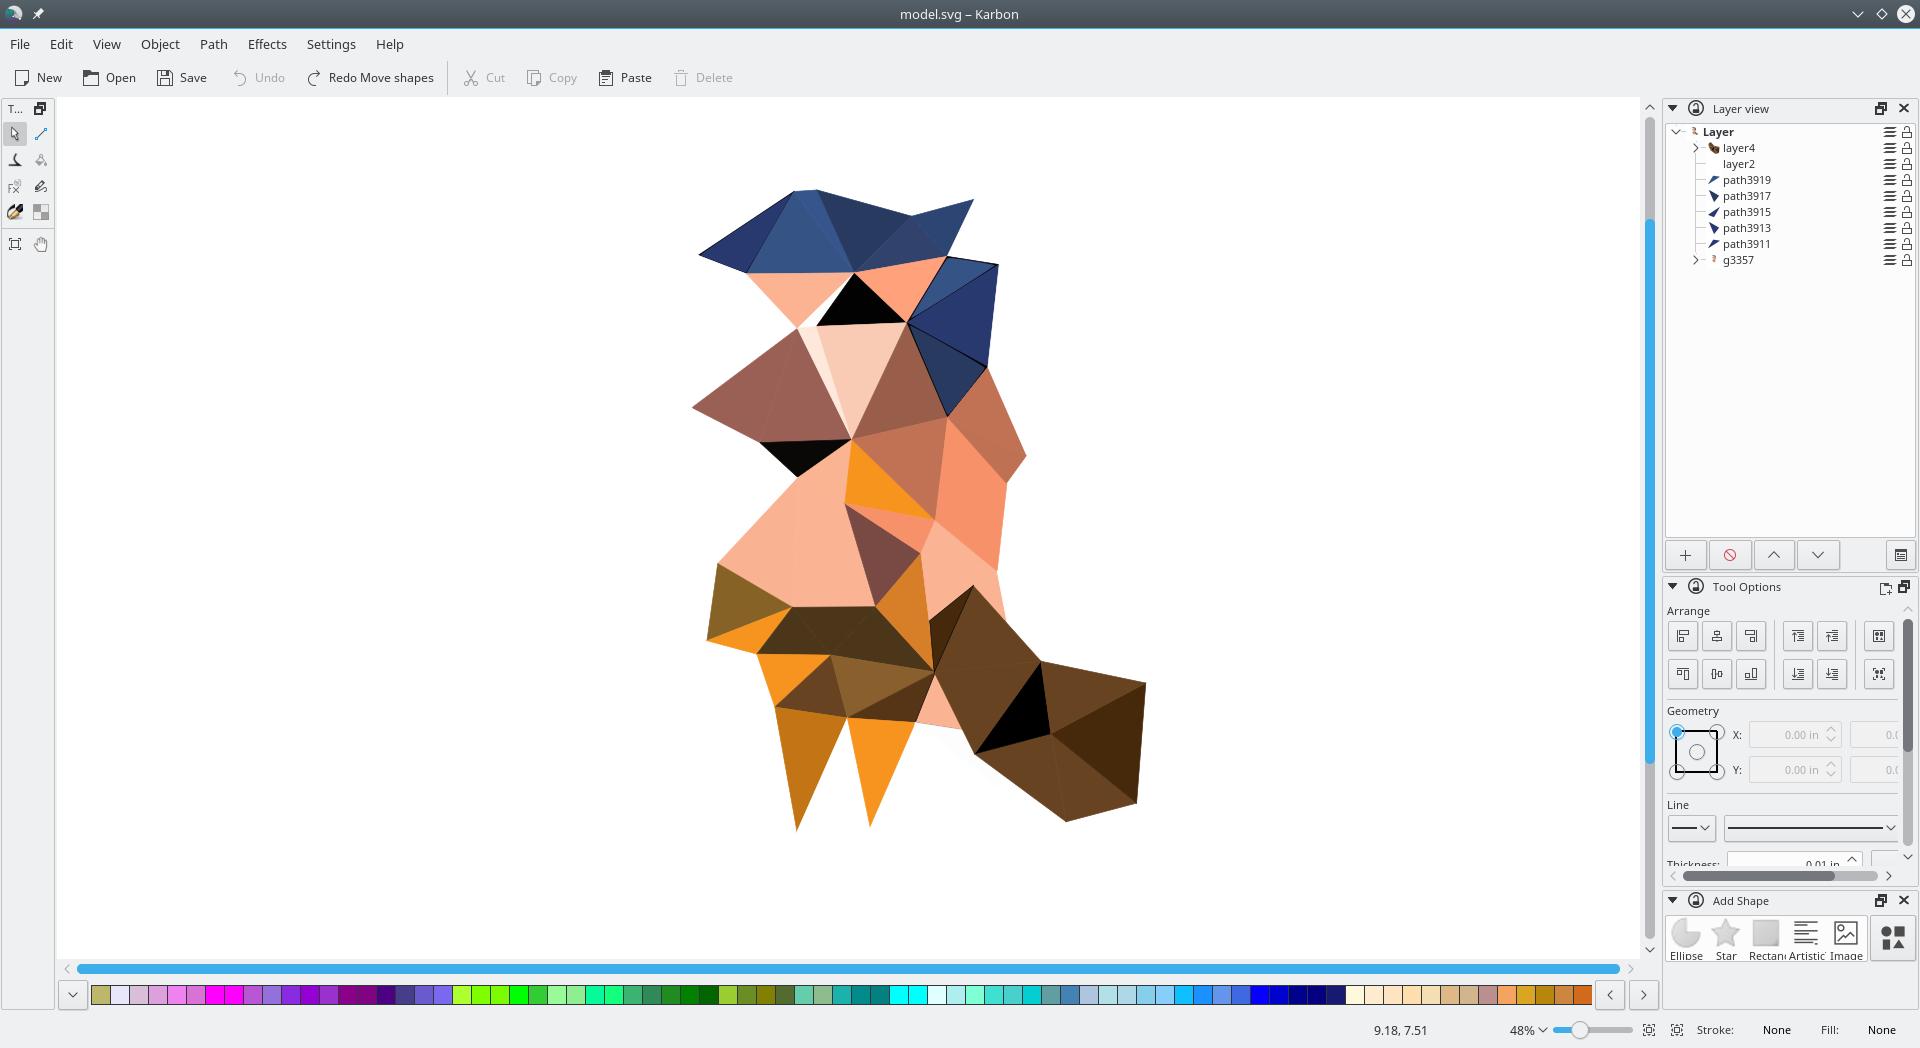 KDE - Karbon - Scalable Graphics